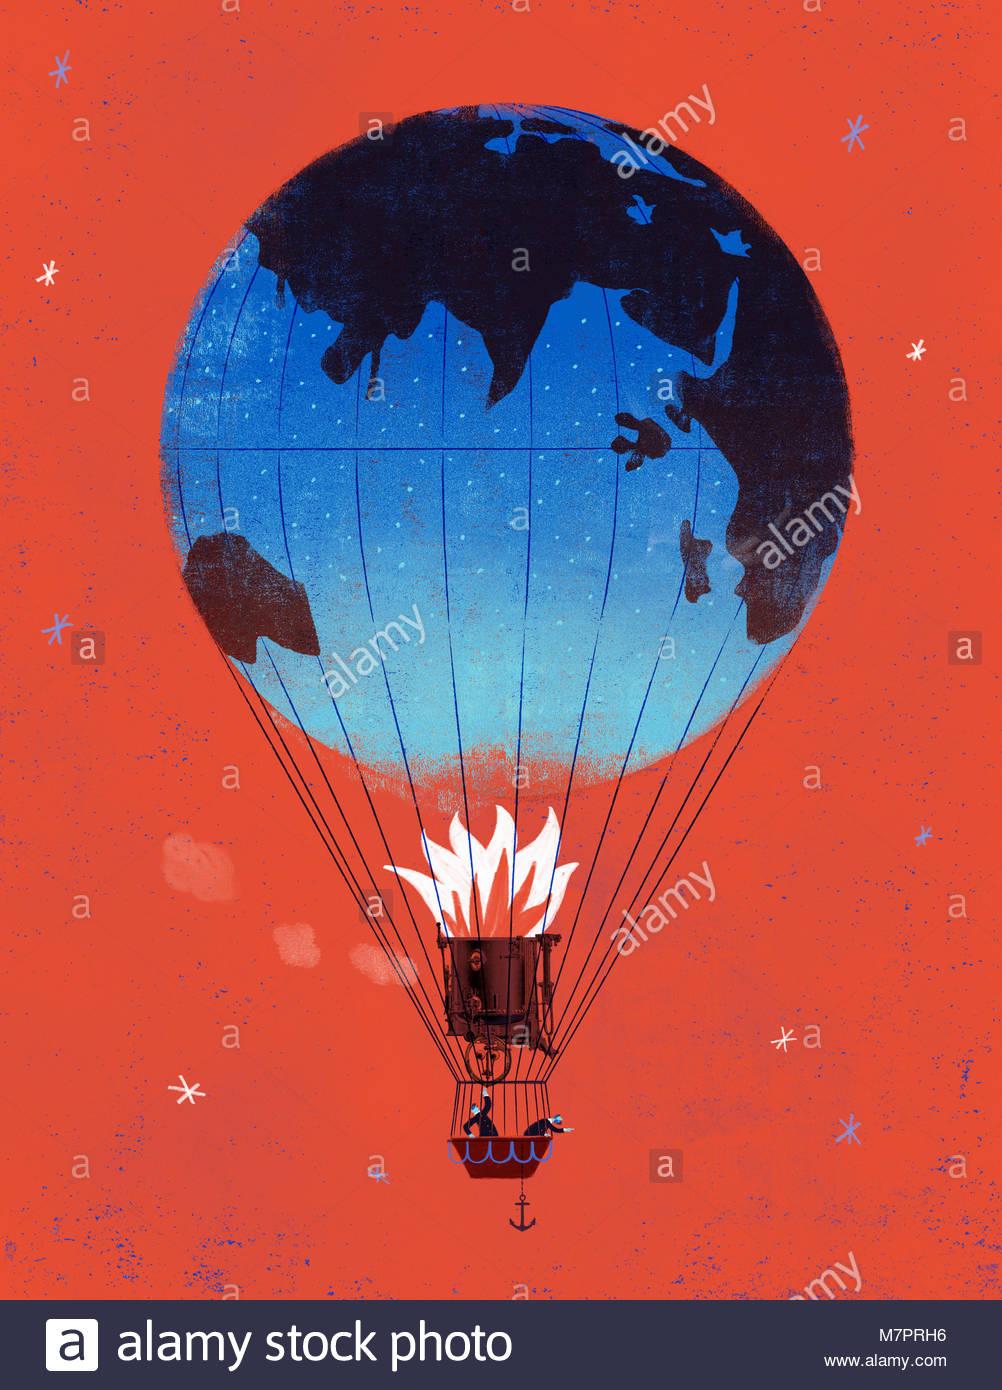 Steampunk globe hot air balloon - Stock Image